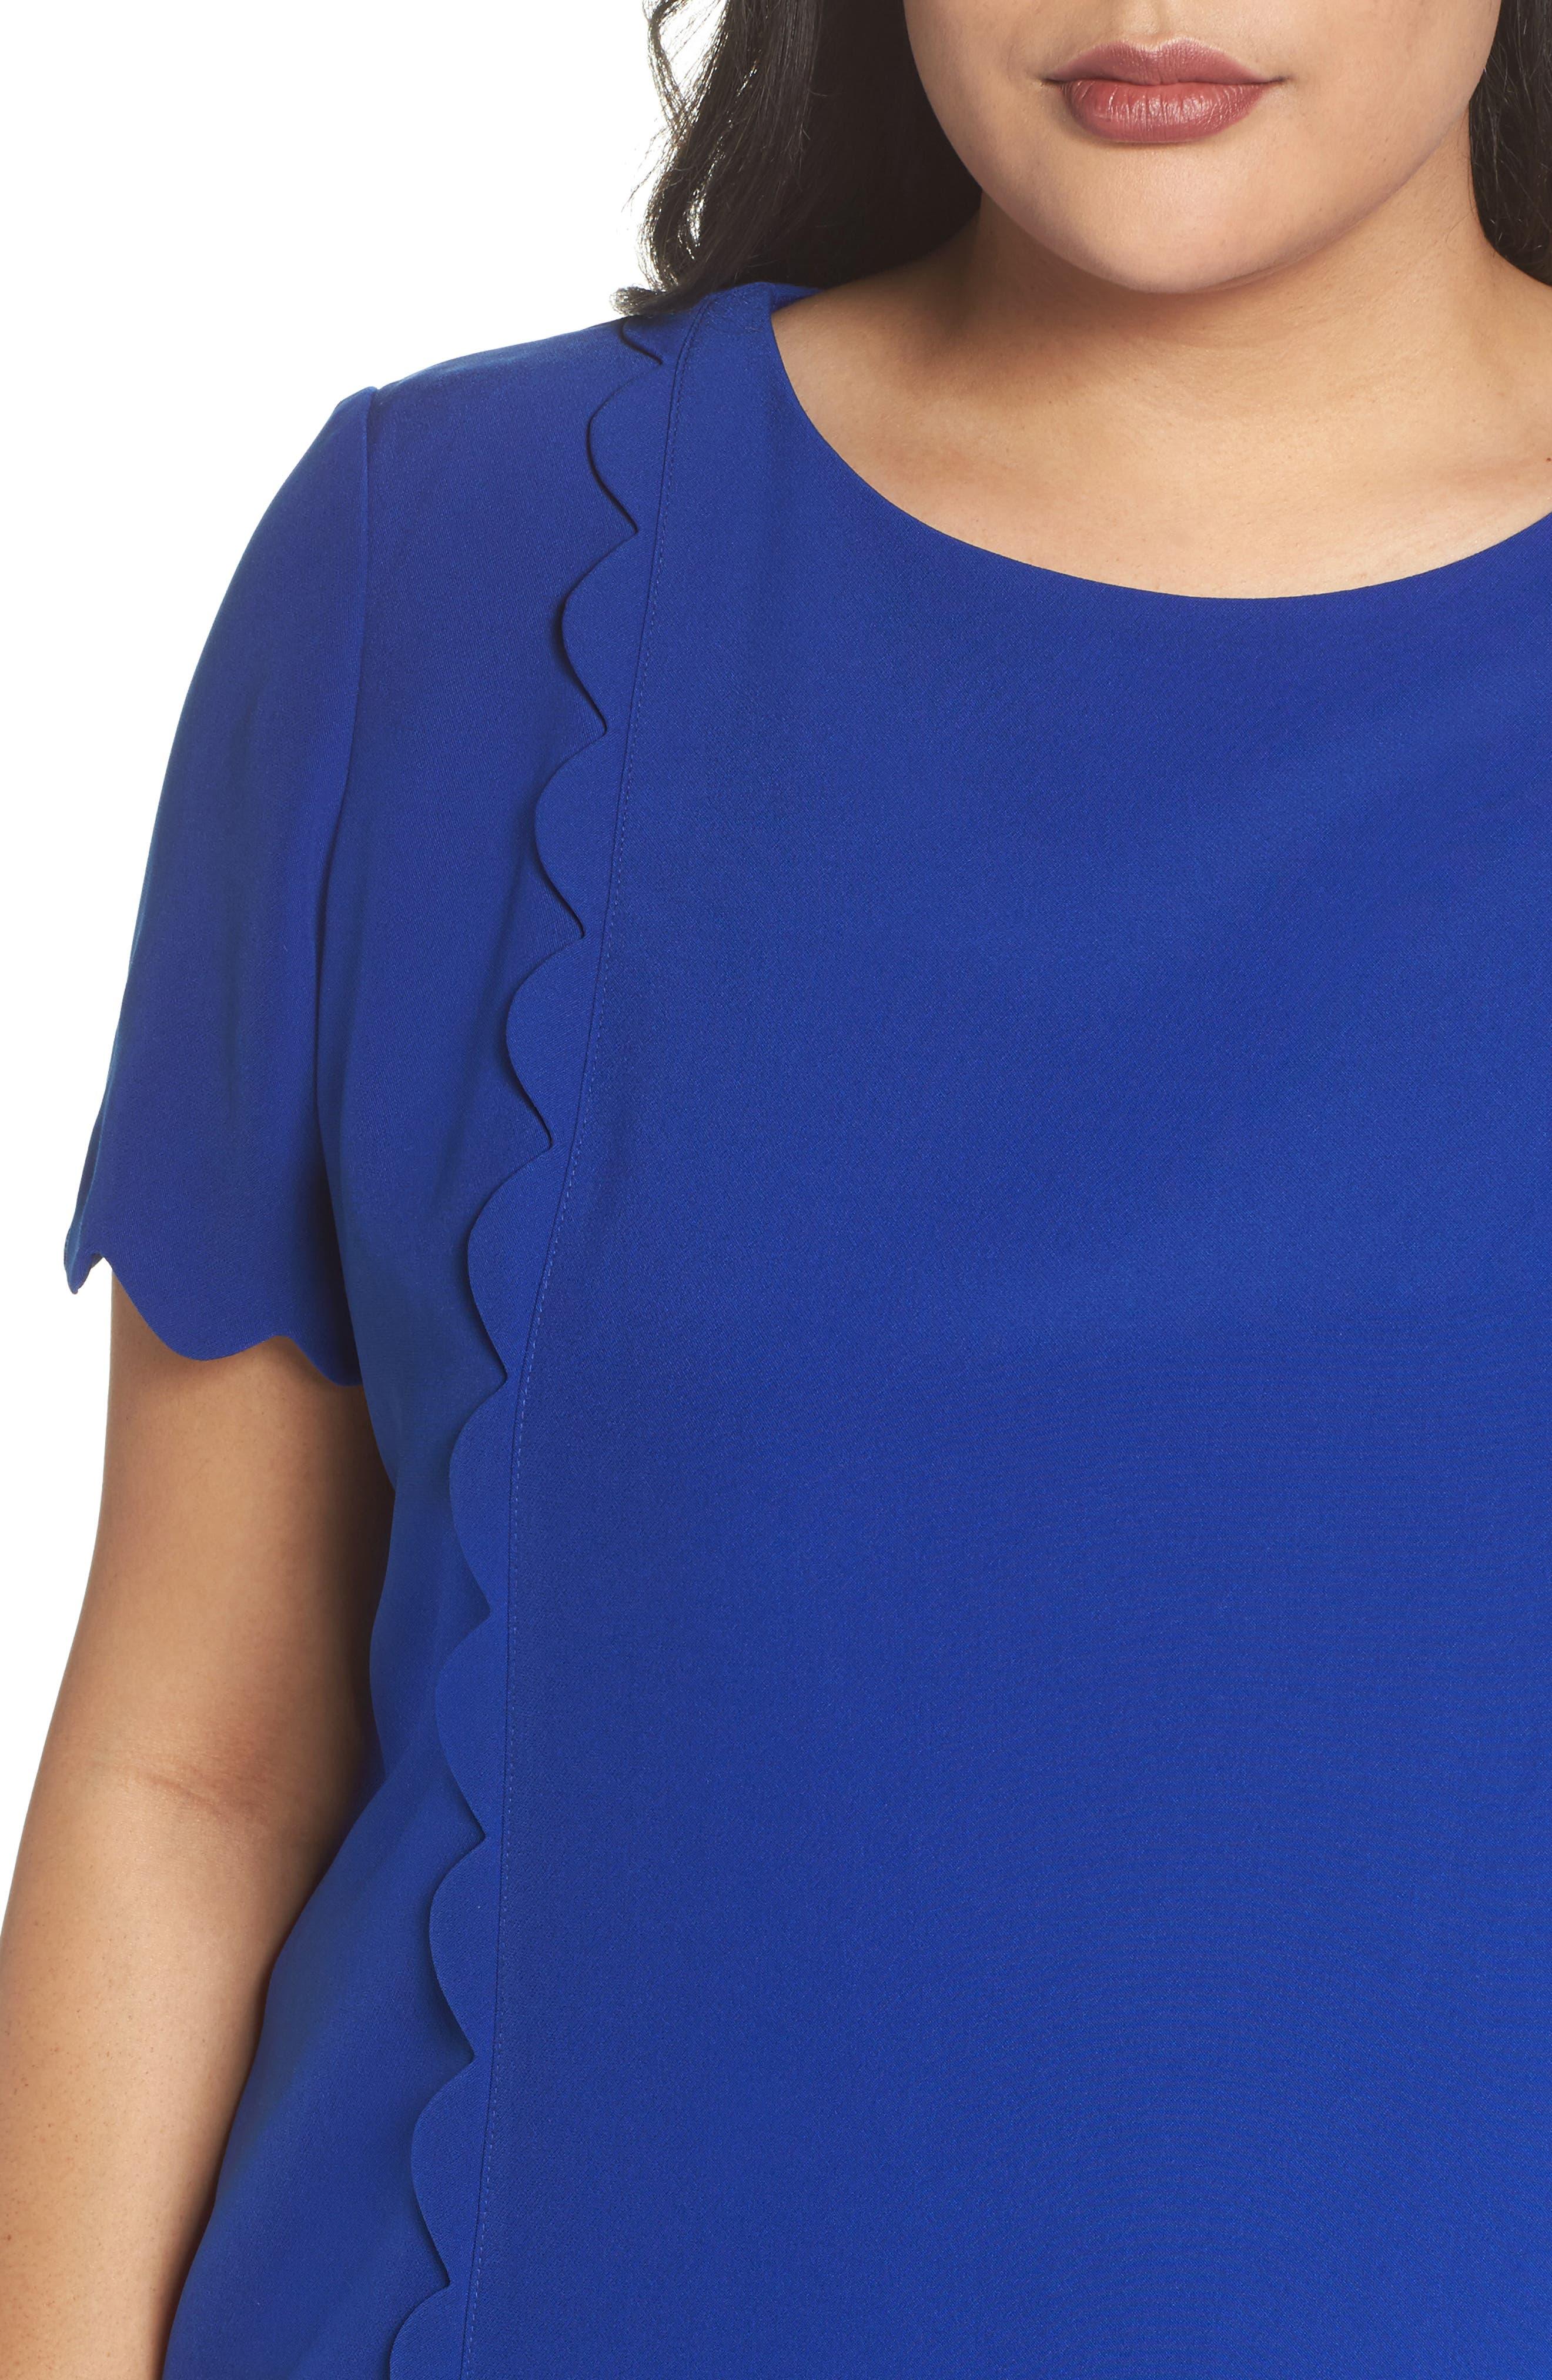 Alternate Image 4  - Tahari Scalloped Trim Shift Dress (Plus Size)